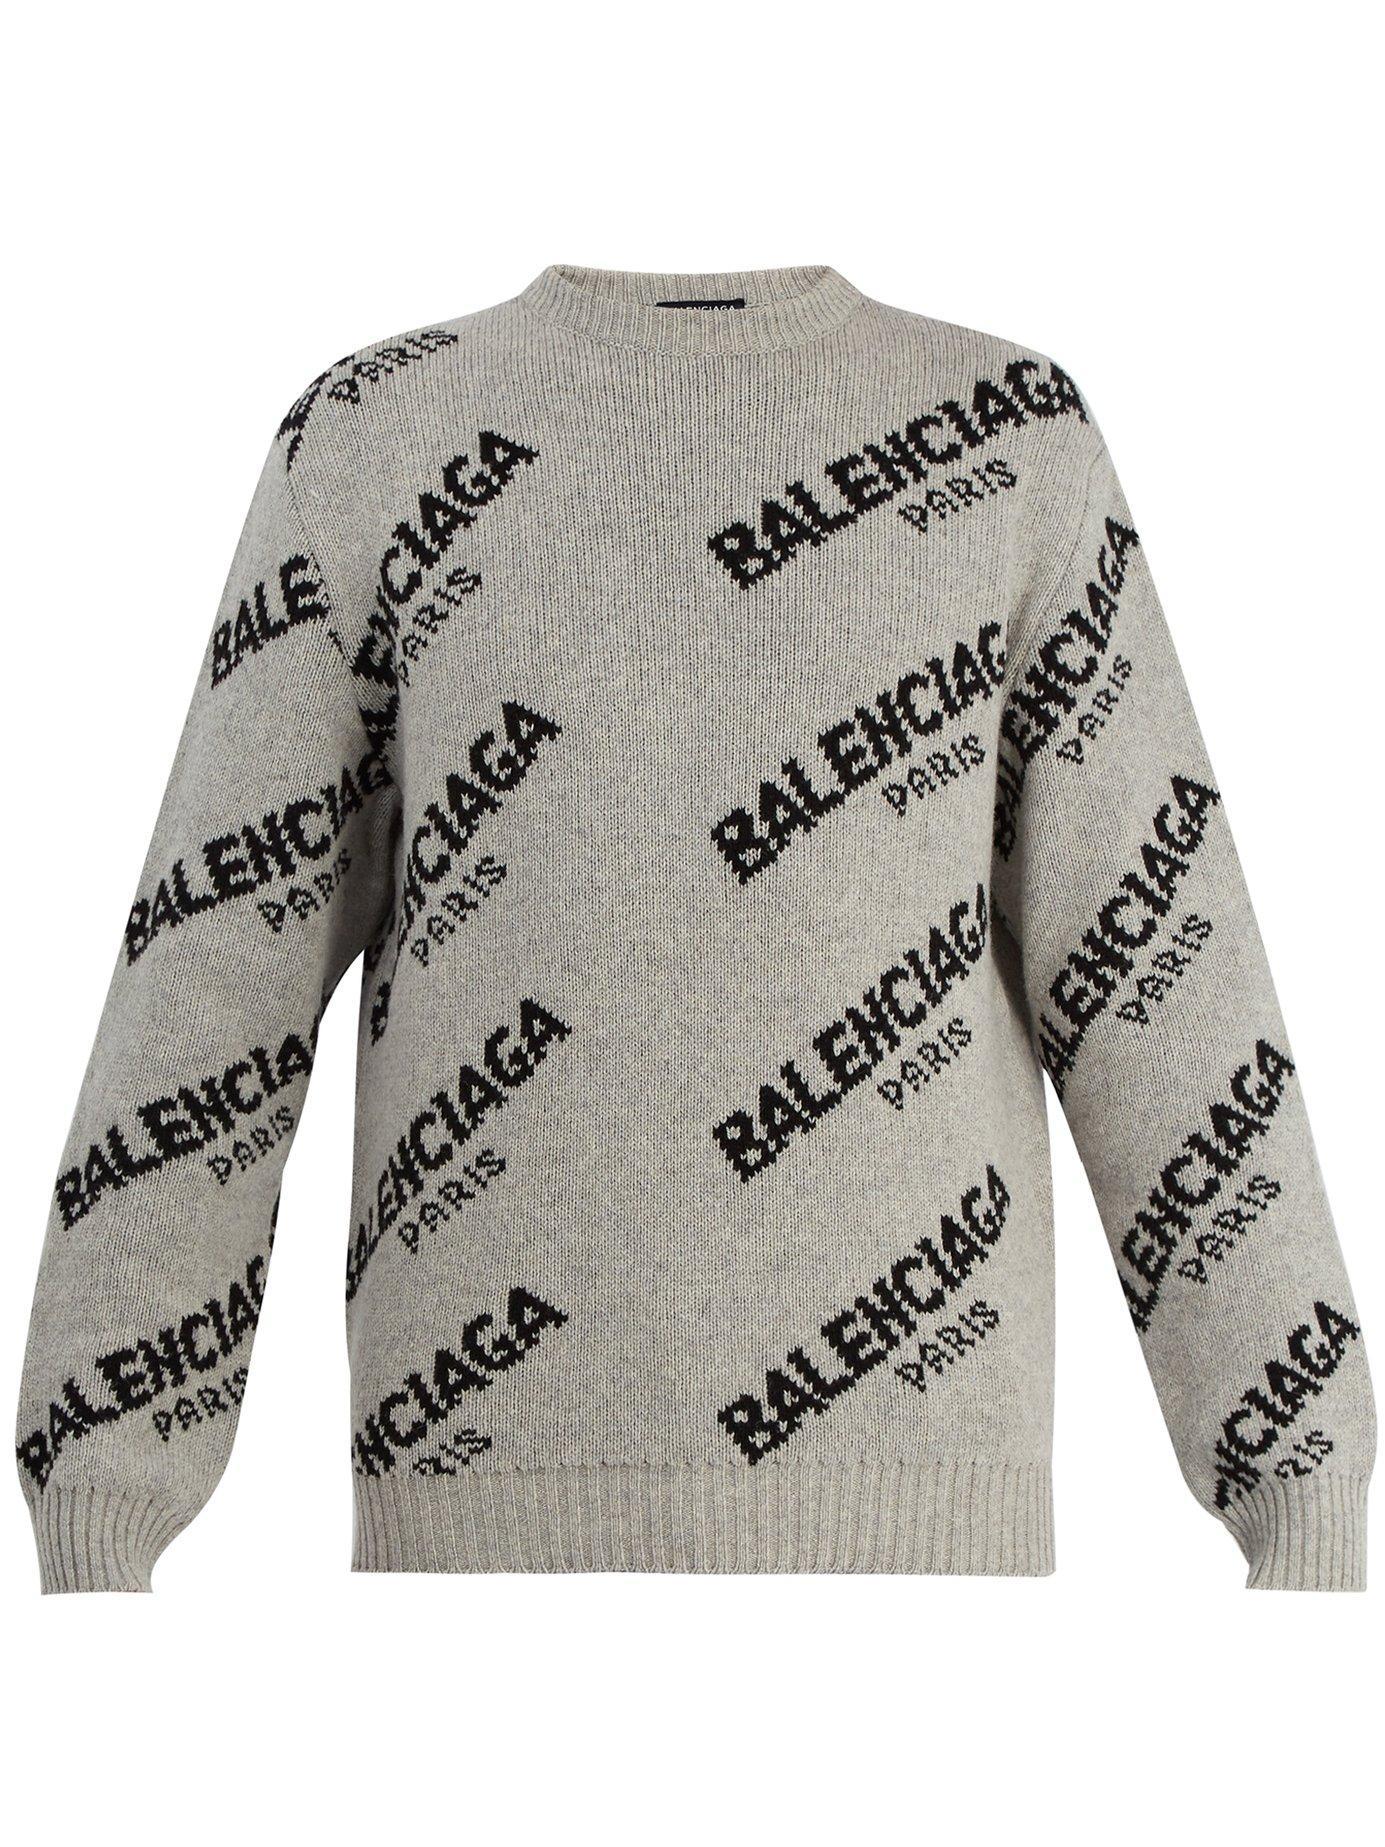 8343c66699dd9 Balenciaga Logo-Jacquard Crew-Neck Knit Sweater In Grey